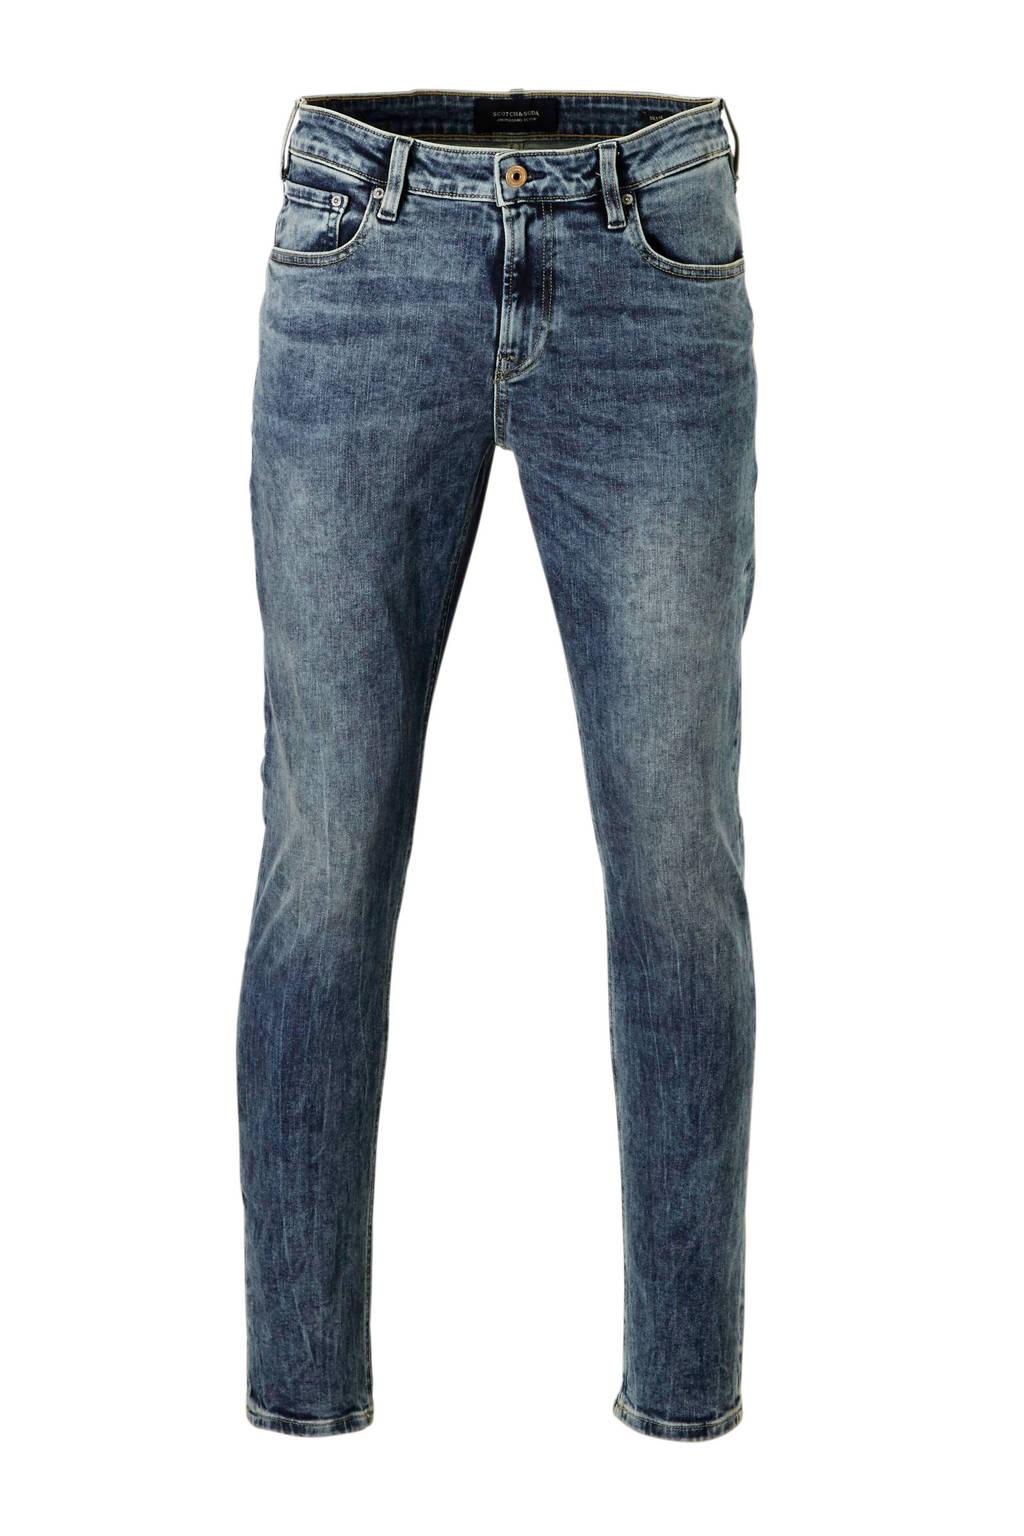 Scotch & Soda skinny jeans Skim, Light denim